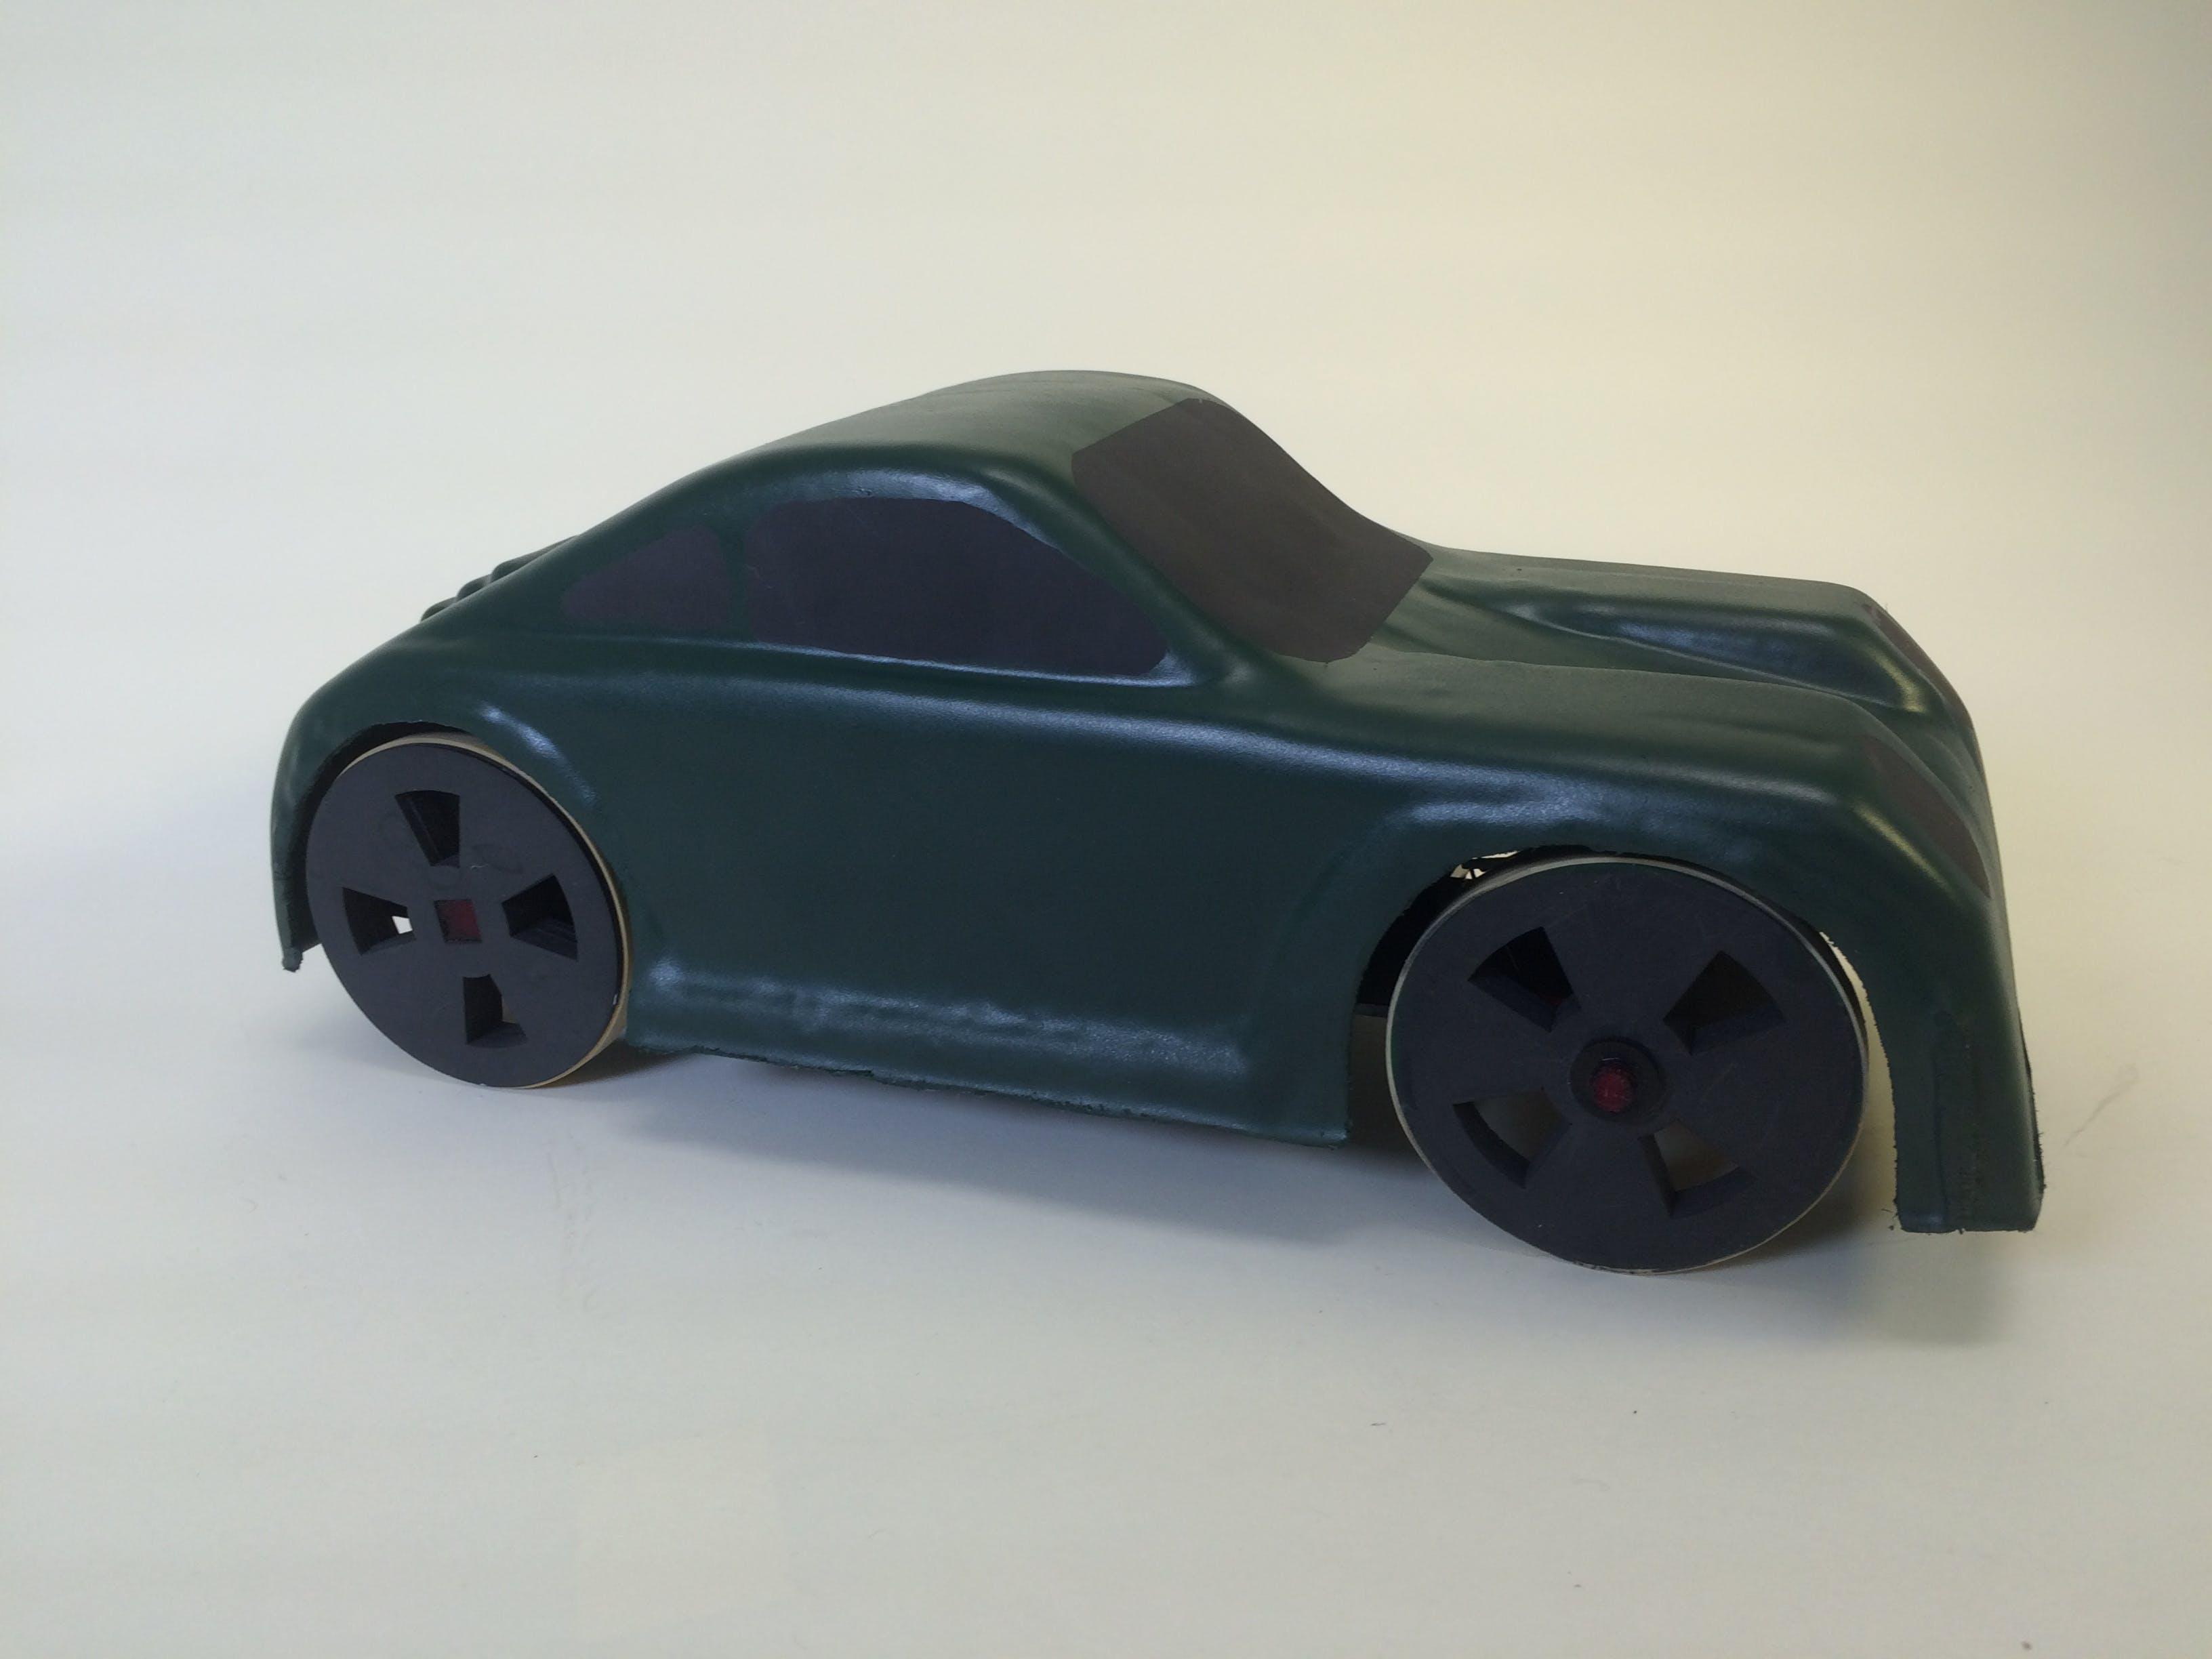 Porsche-Inspired RC Vehicle